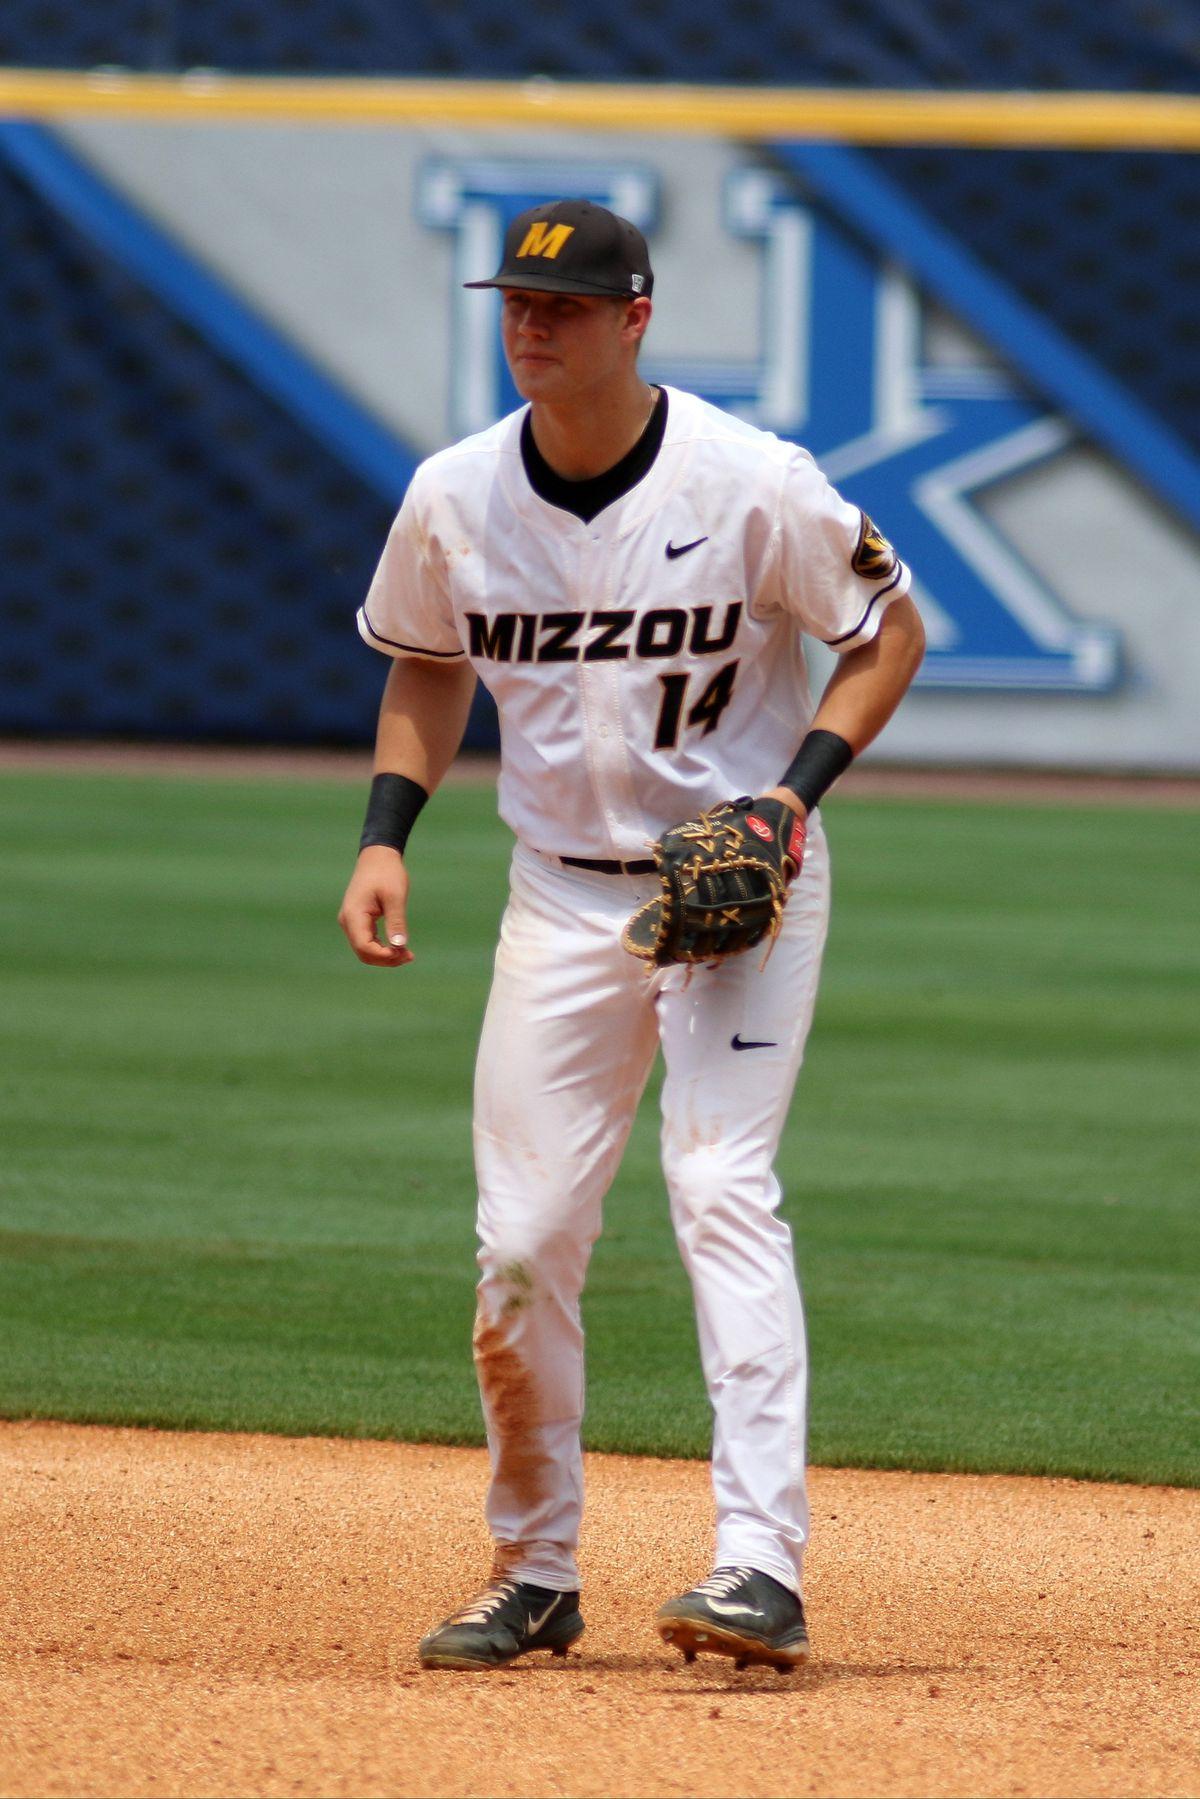 NCAA BASEBALL: MAY 19 SEC Baseball Tournament - Missouri v South Carolina